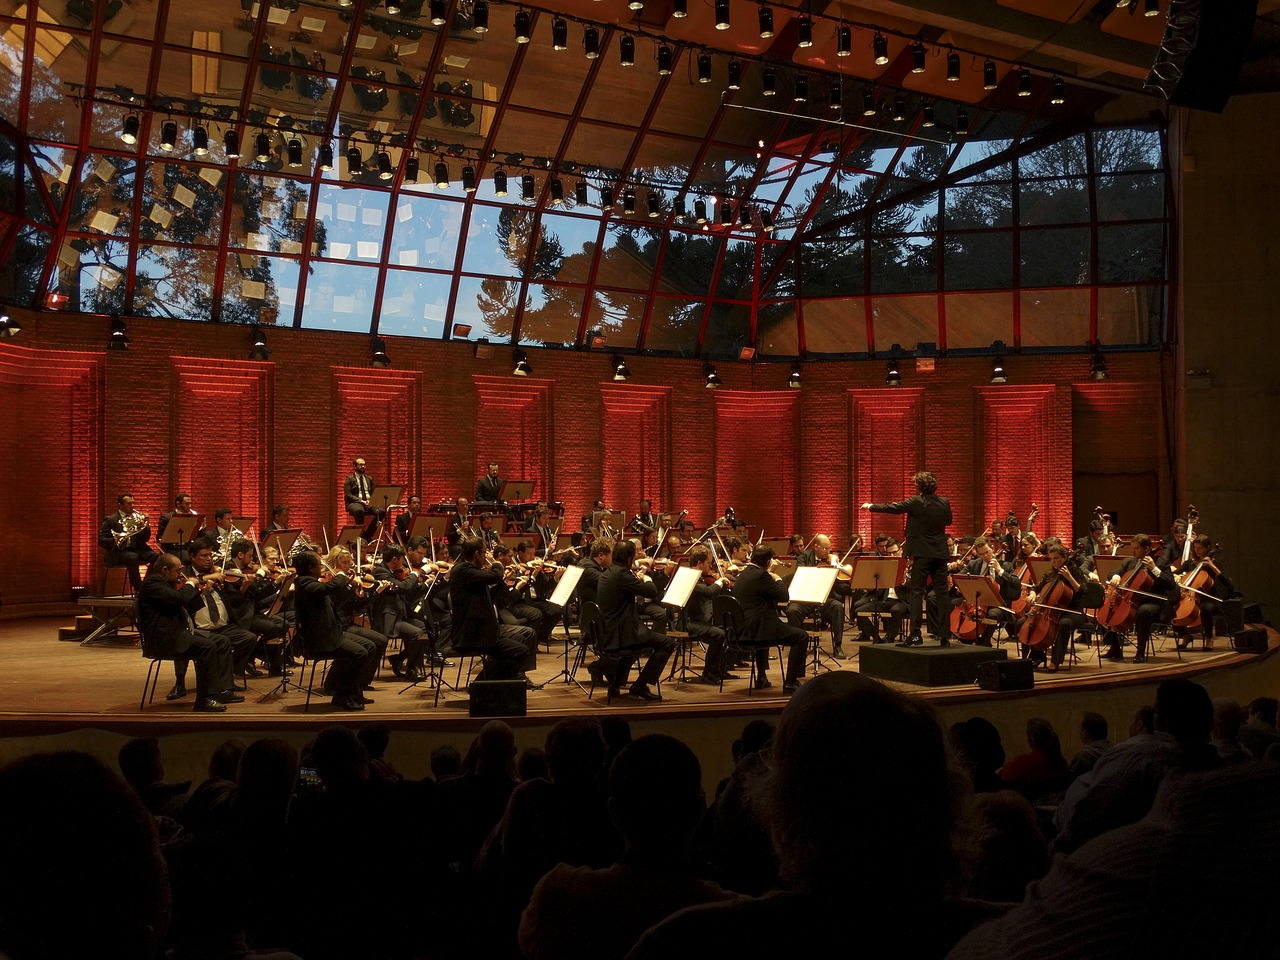 orchestra-1701842_1280(1)